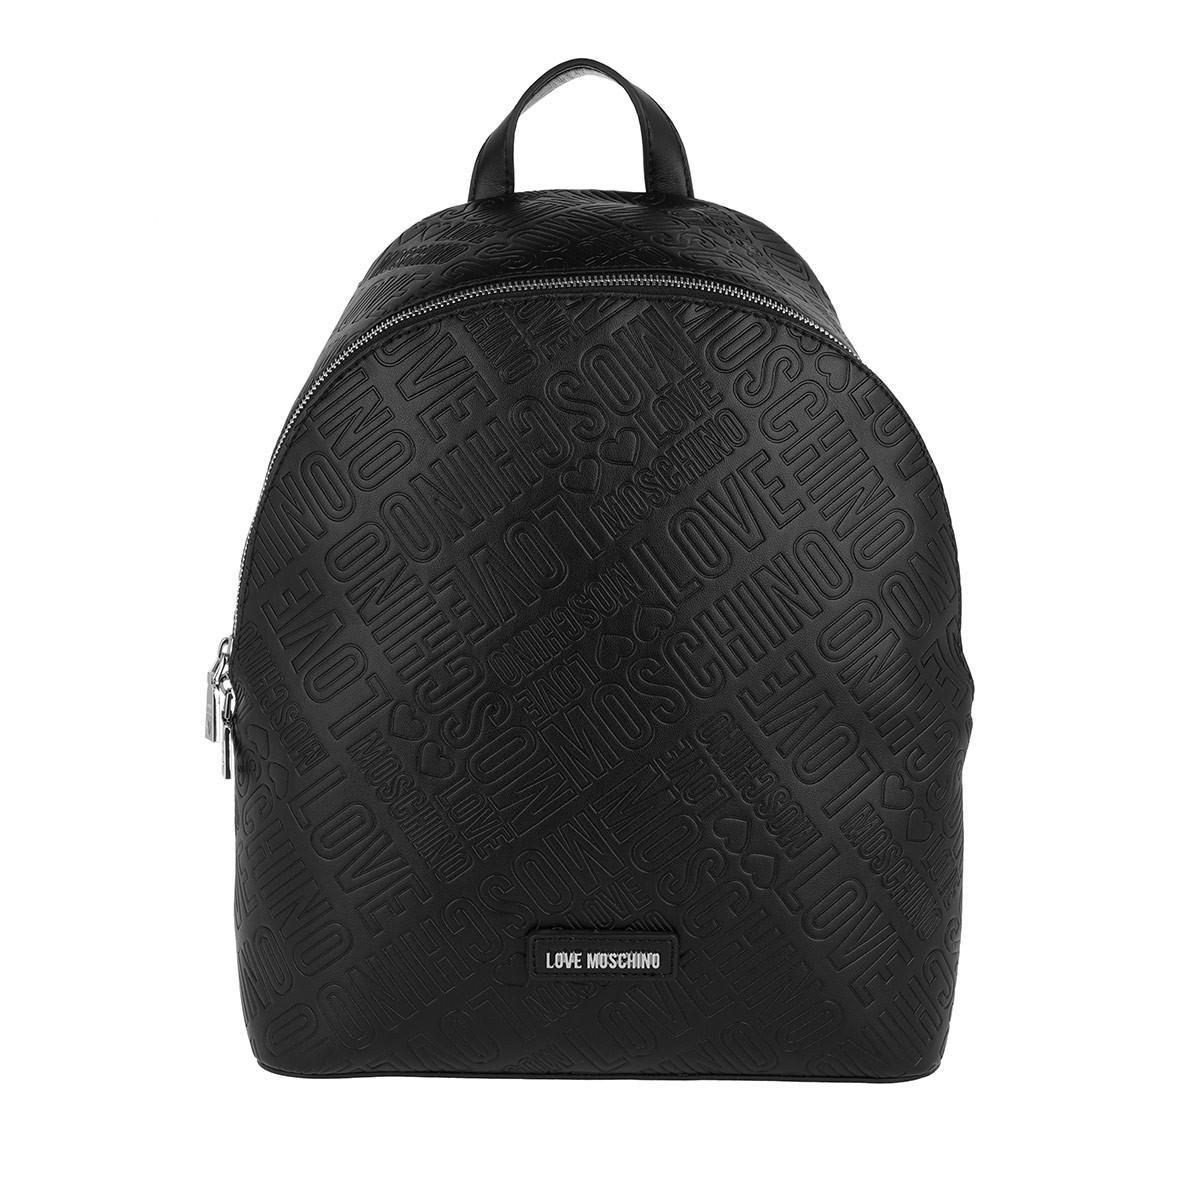 fdbf9b5dca Love Moschino Embossed Backpack Nero in Black - Lyst